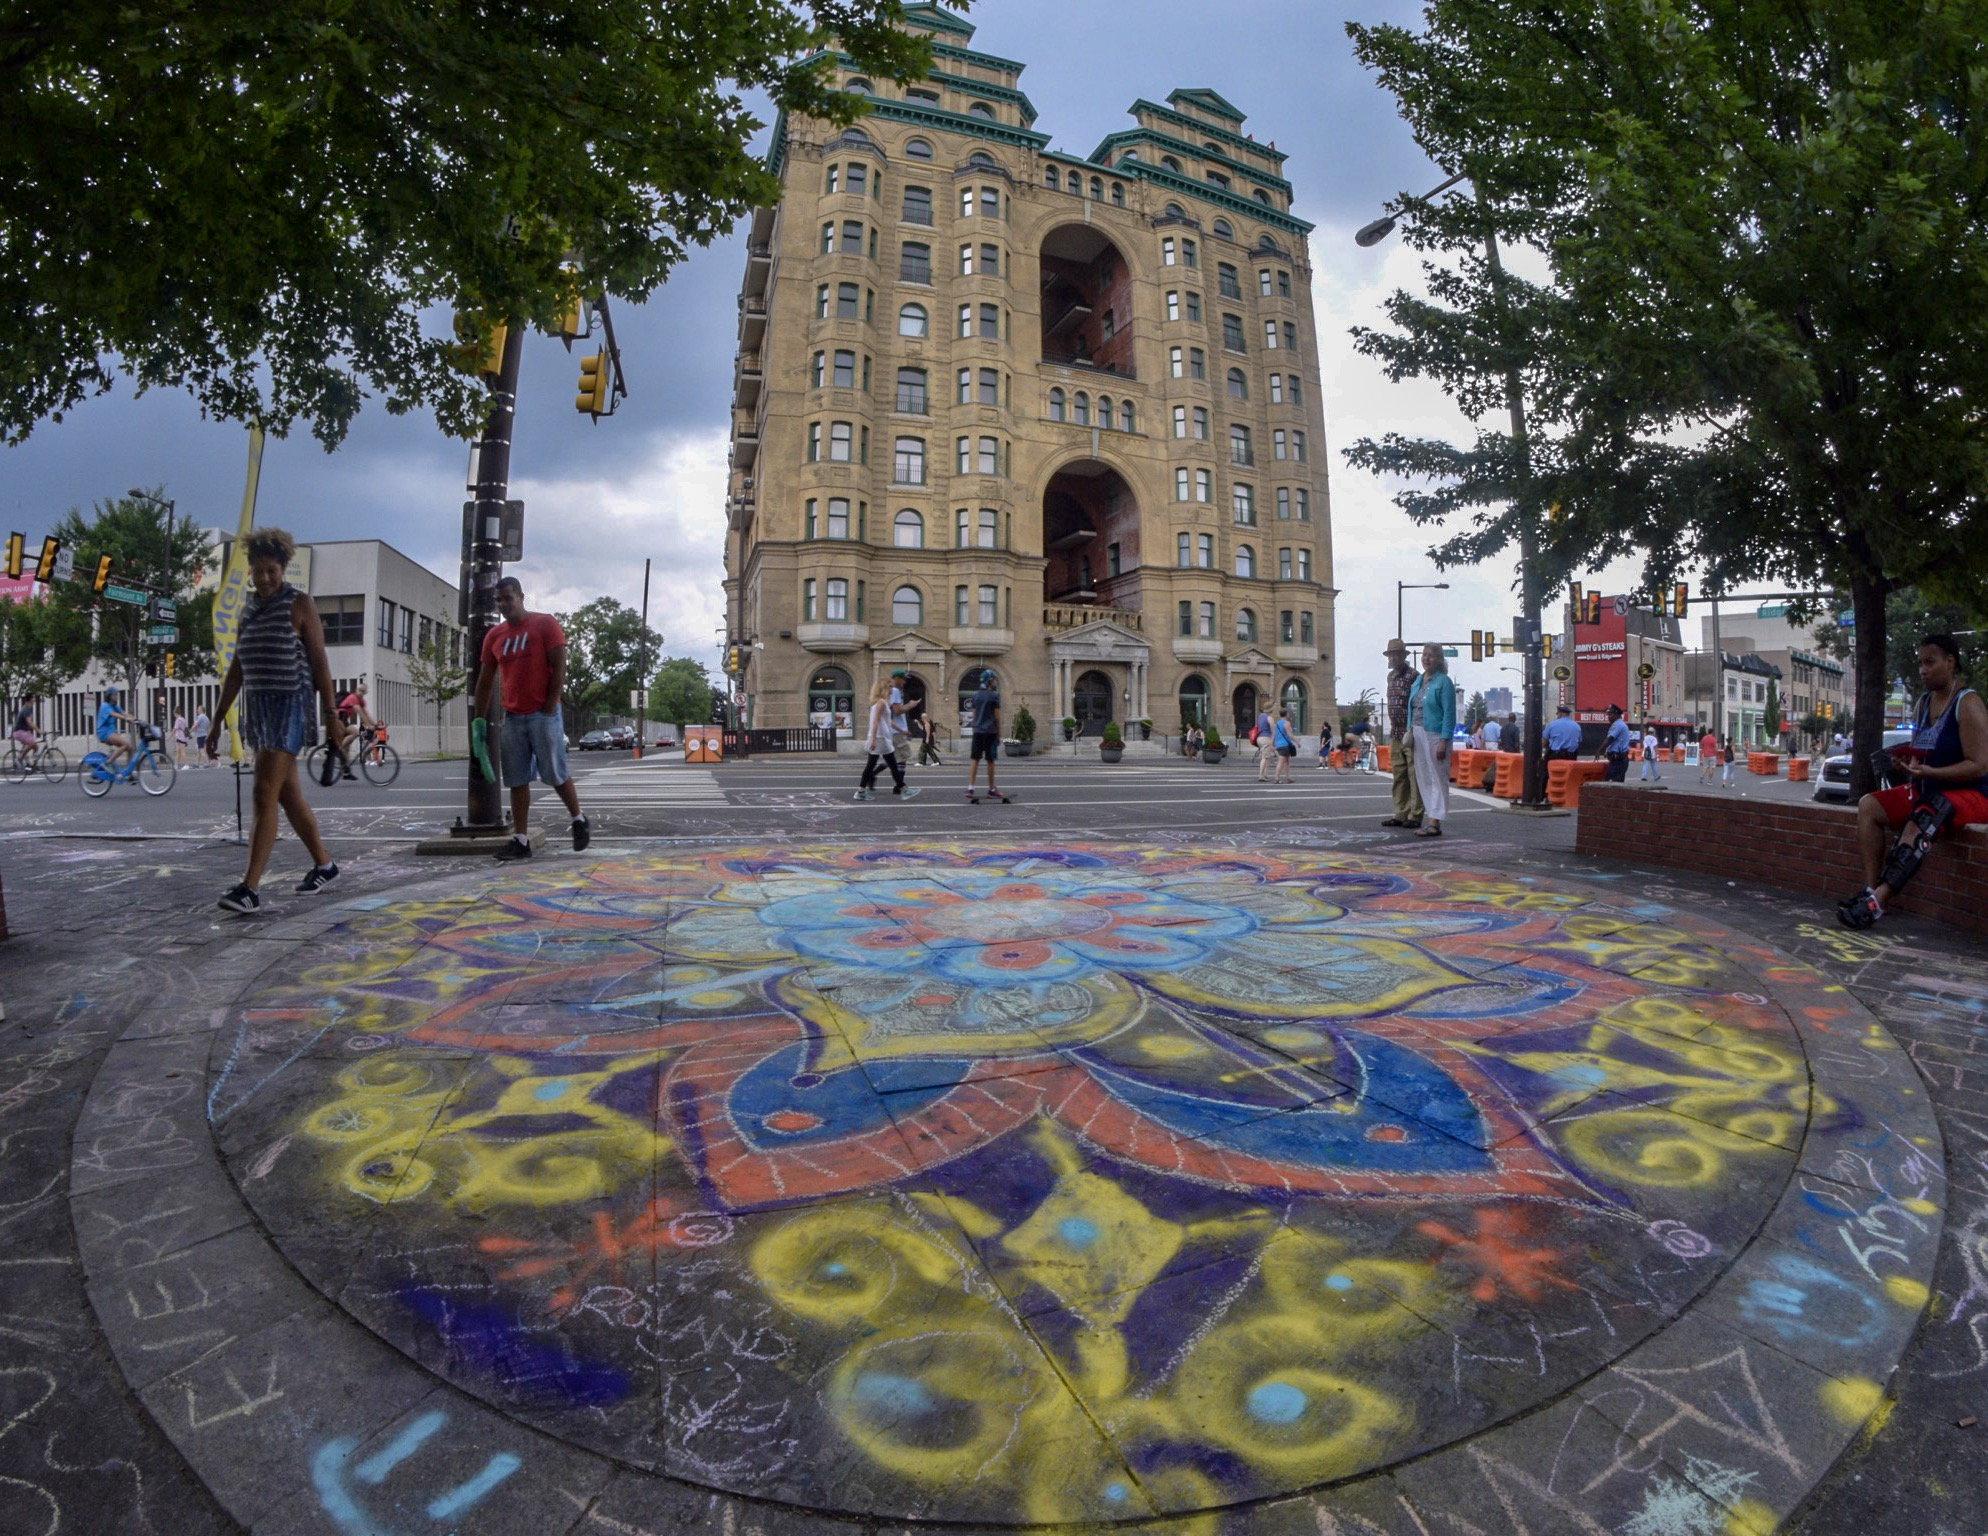 A chalk Peace mandala across the street from the Divine Lorraine.